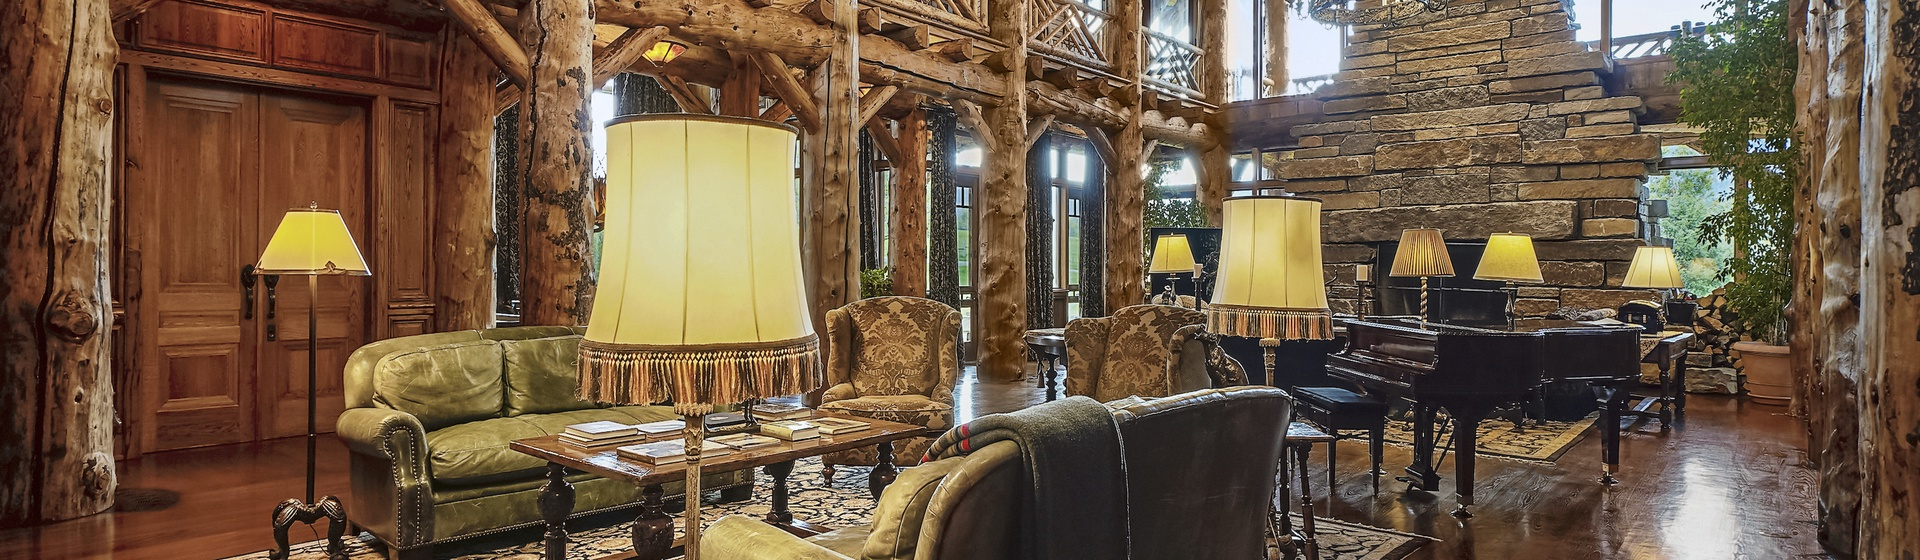 1.1-Telluride-Sleeping-Indian-Ranch-living-room-1-web.JPG